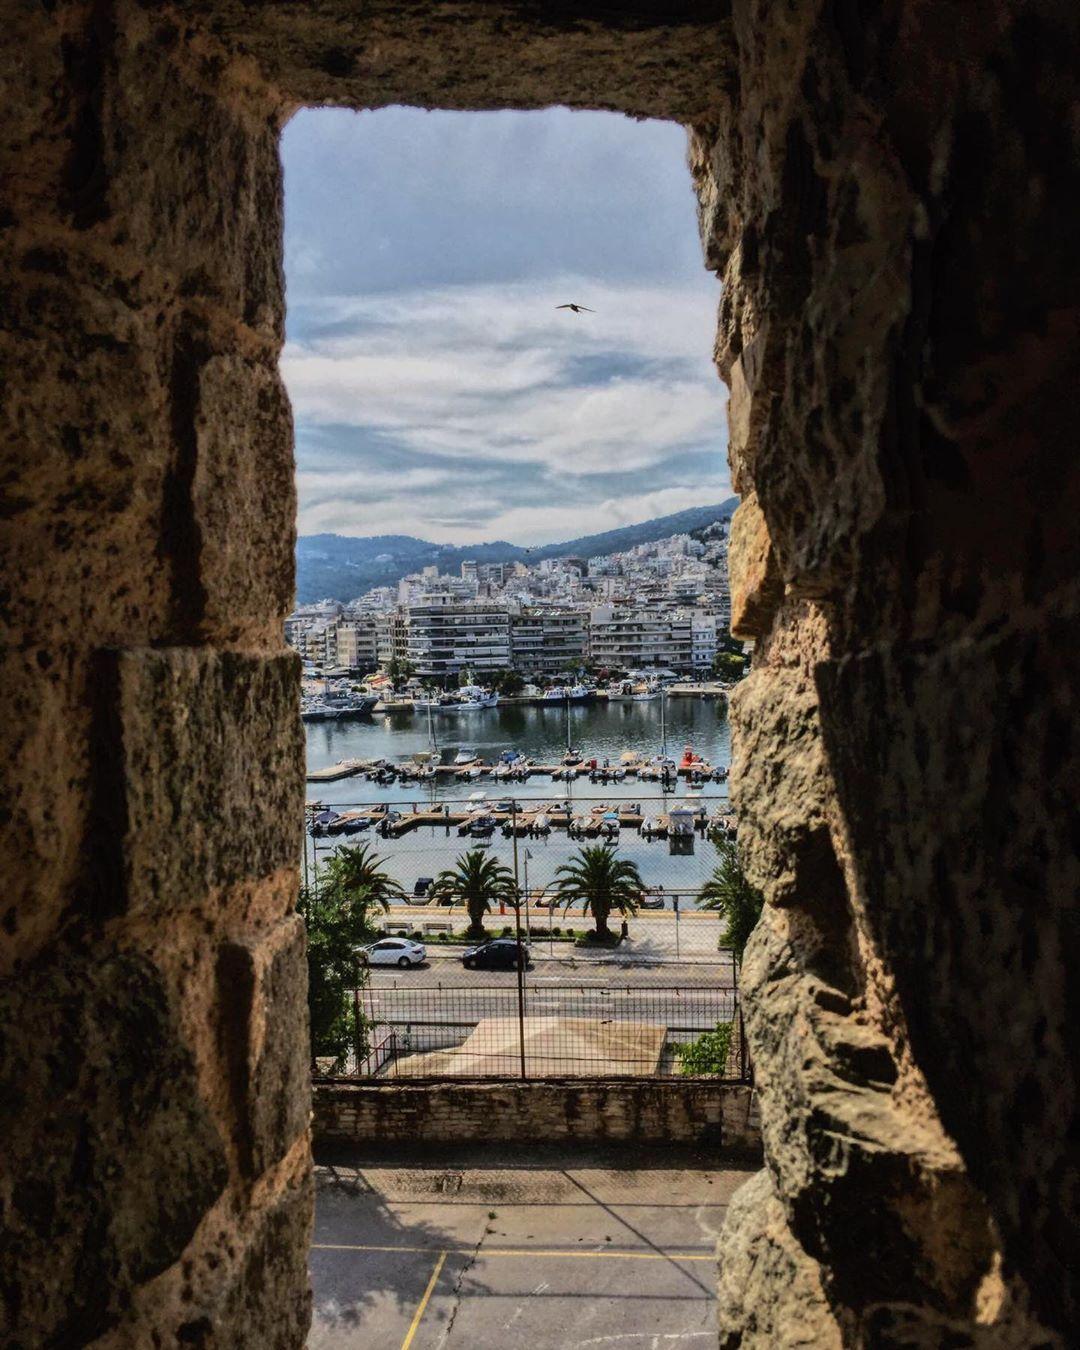 "📍Kavala, Greece on Instagram: """"Beautiful view "" • • • #photographer #photoslover #instagramphotos #photography #photooftheday #photographylife #sky #photographyeveryday…"""